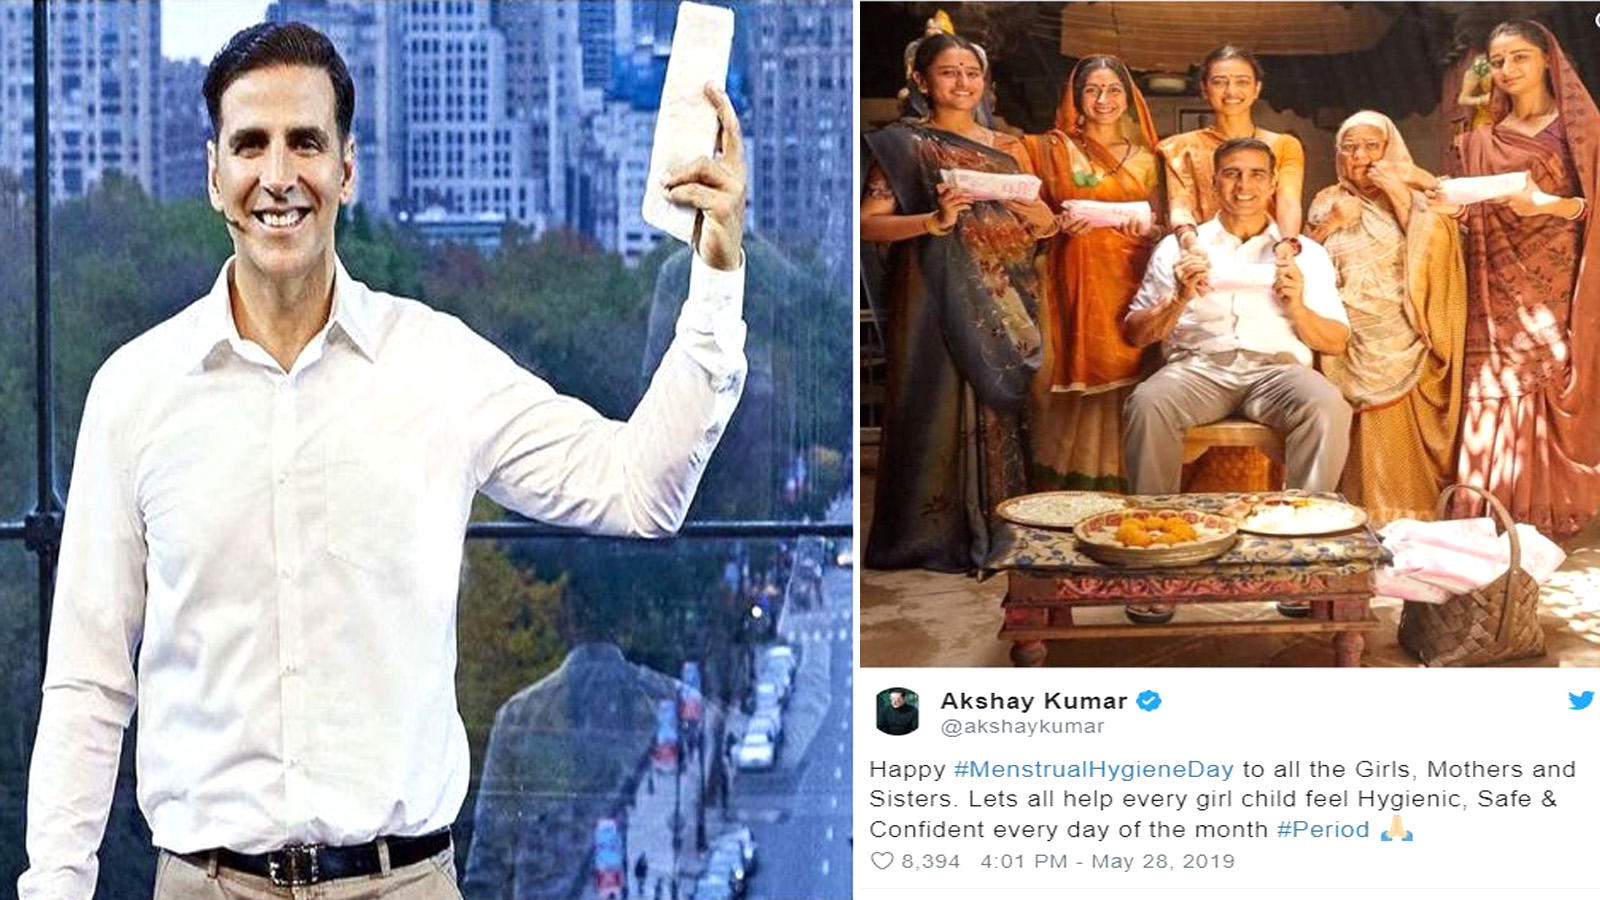 World Menstrual Hygiene Day: Akshay Kumar shares a beautiful message